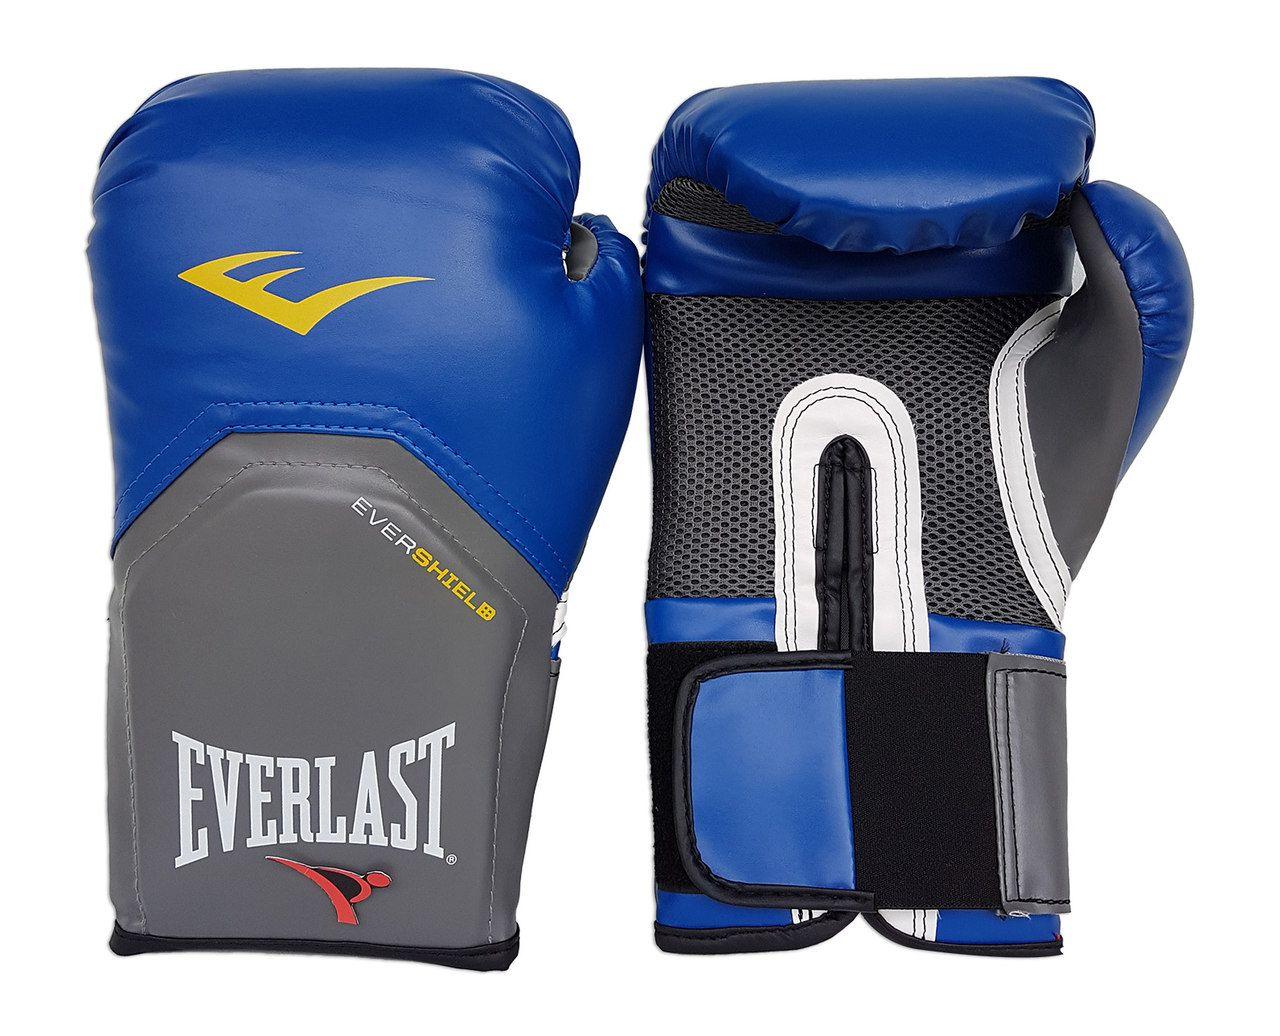 Luva de Boxe / Muay Thai 12oz - Azul - Pro Style - Everlast  - PRALUTA SHOP